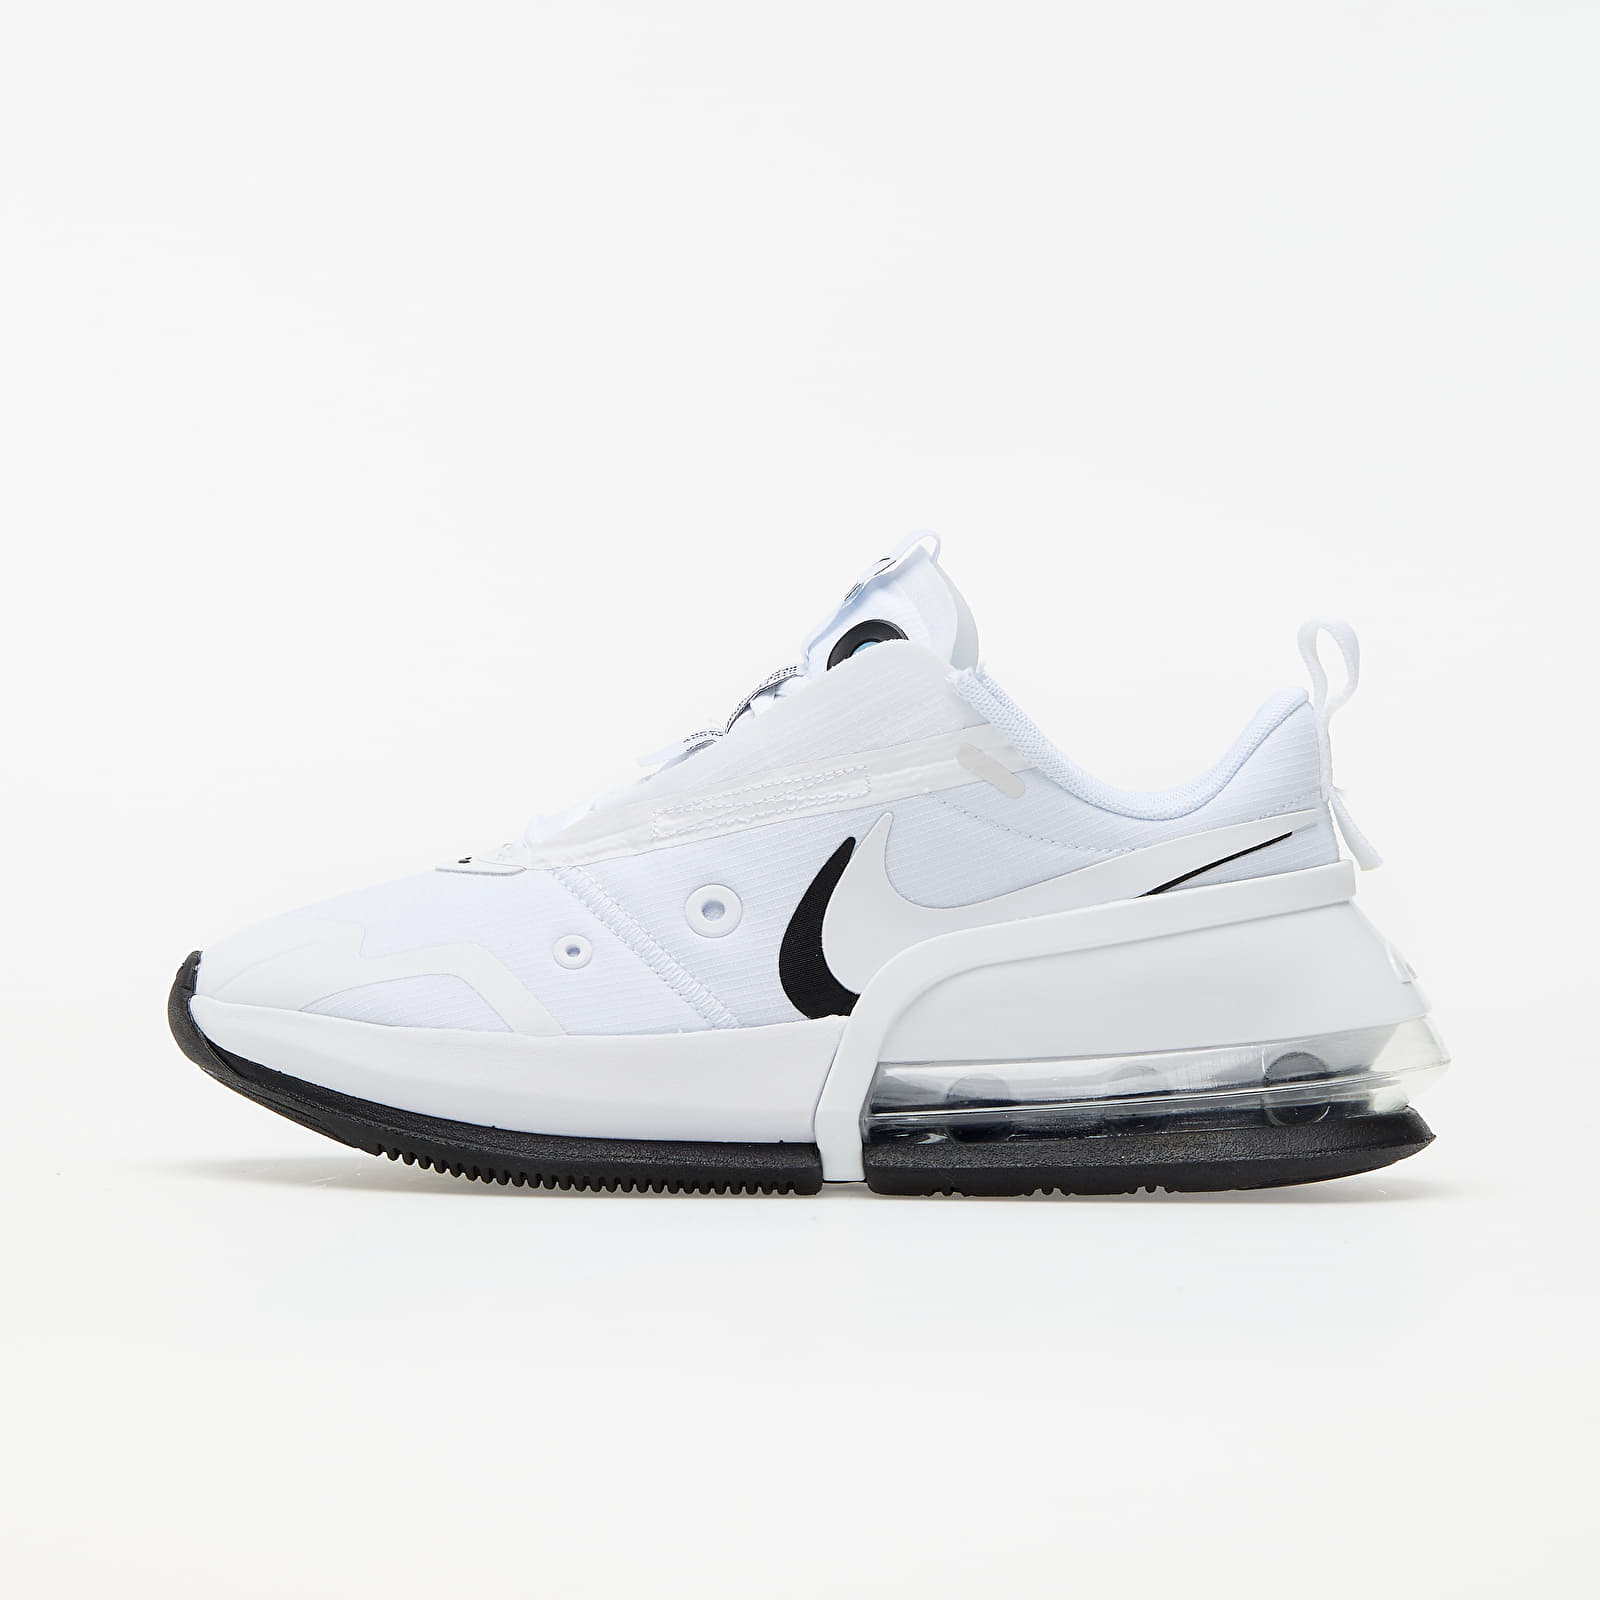 Încălțăminte și sneakerși pentru femei Nike W Air Max Up White/ White-Metallic Silver-Black